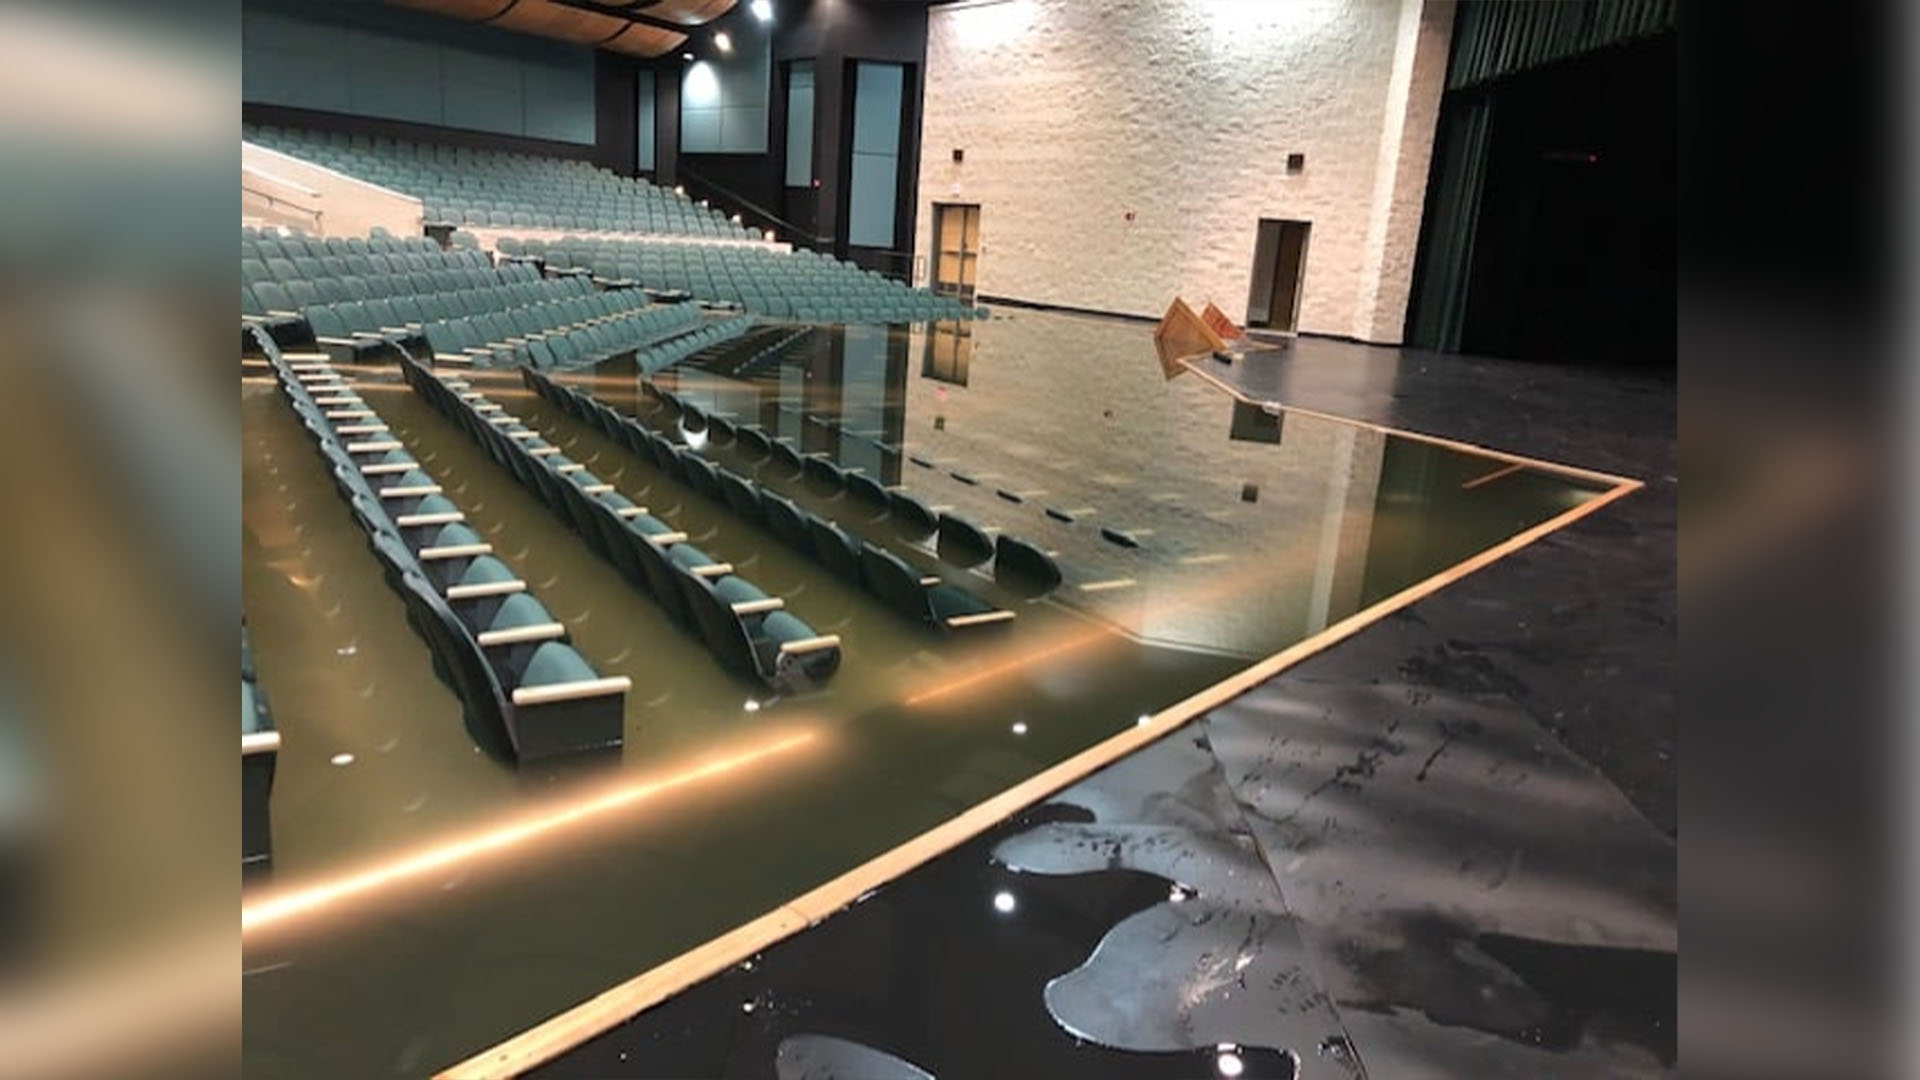 Burnet High School auditorium floods during severe winter storms (Burnet CISD Photo)